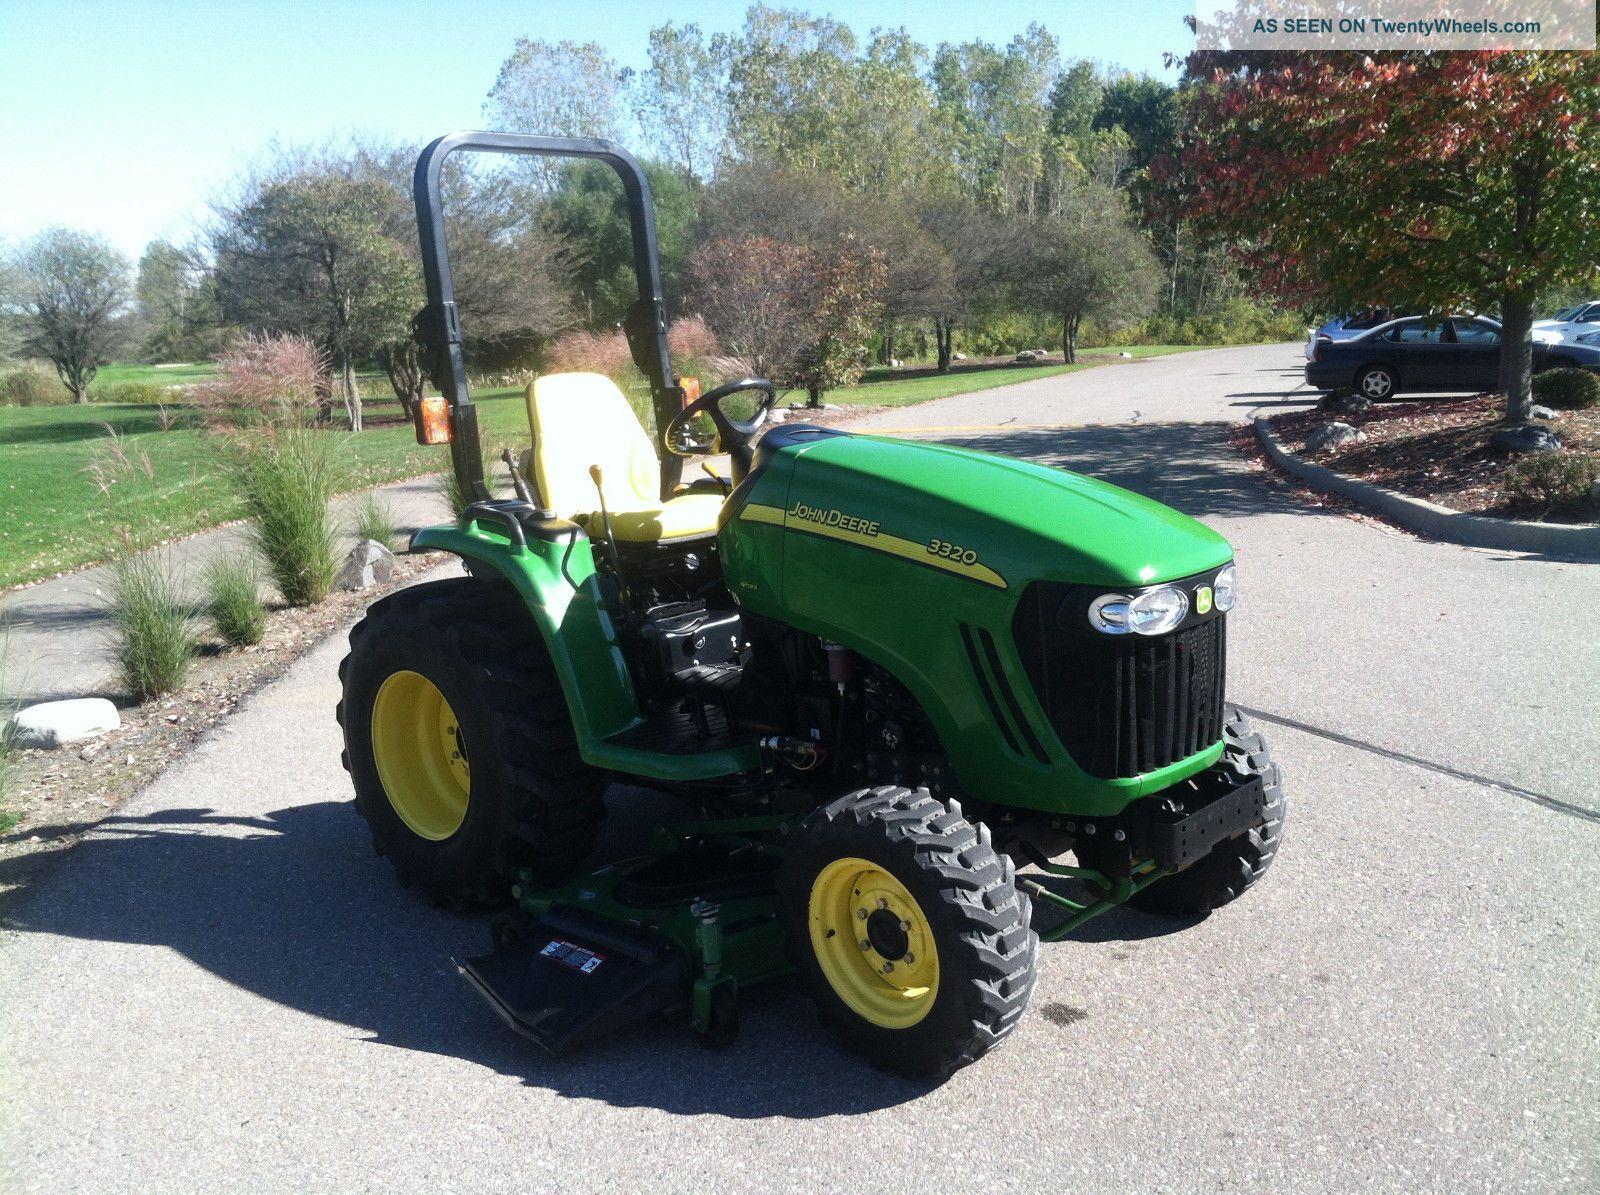 Mitsubishi Tractor Mower Deck : John deere compact utility tractor deck pt